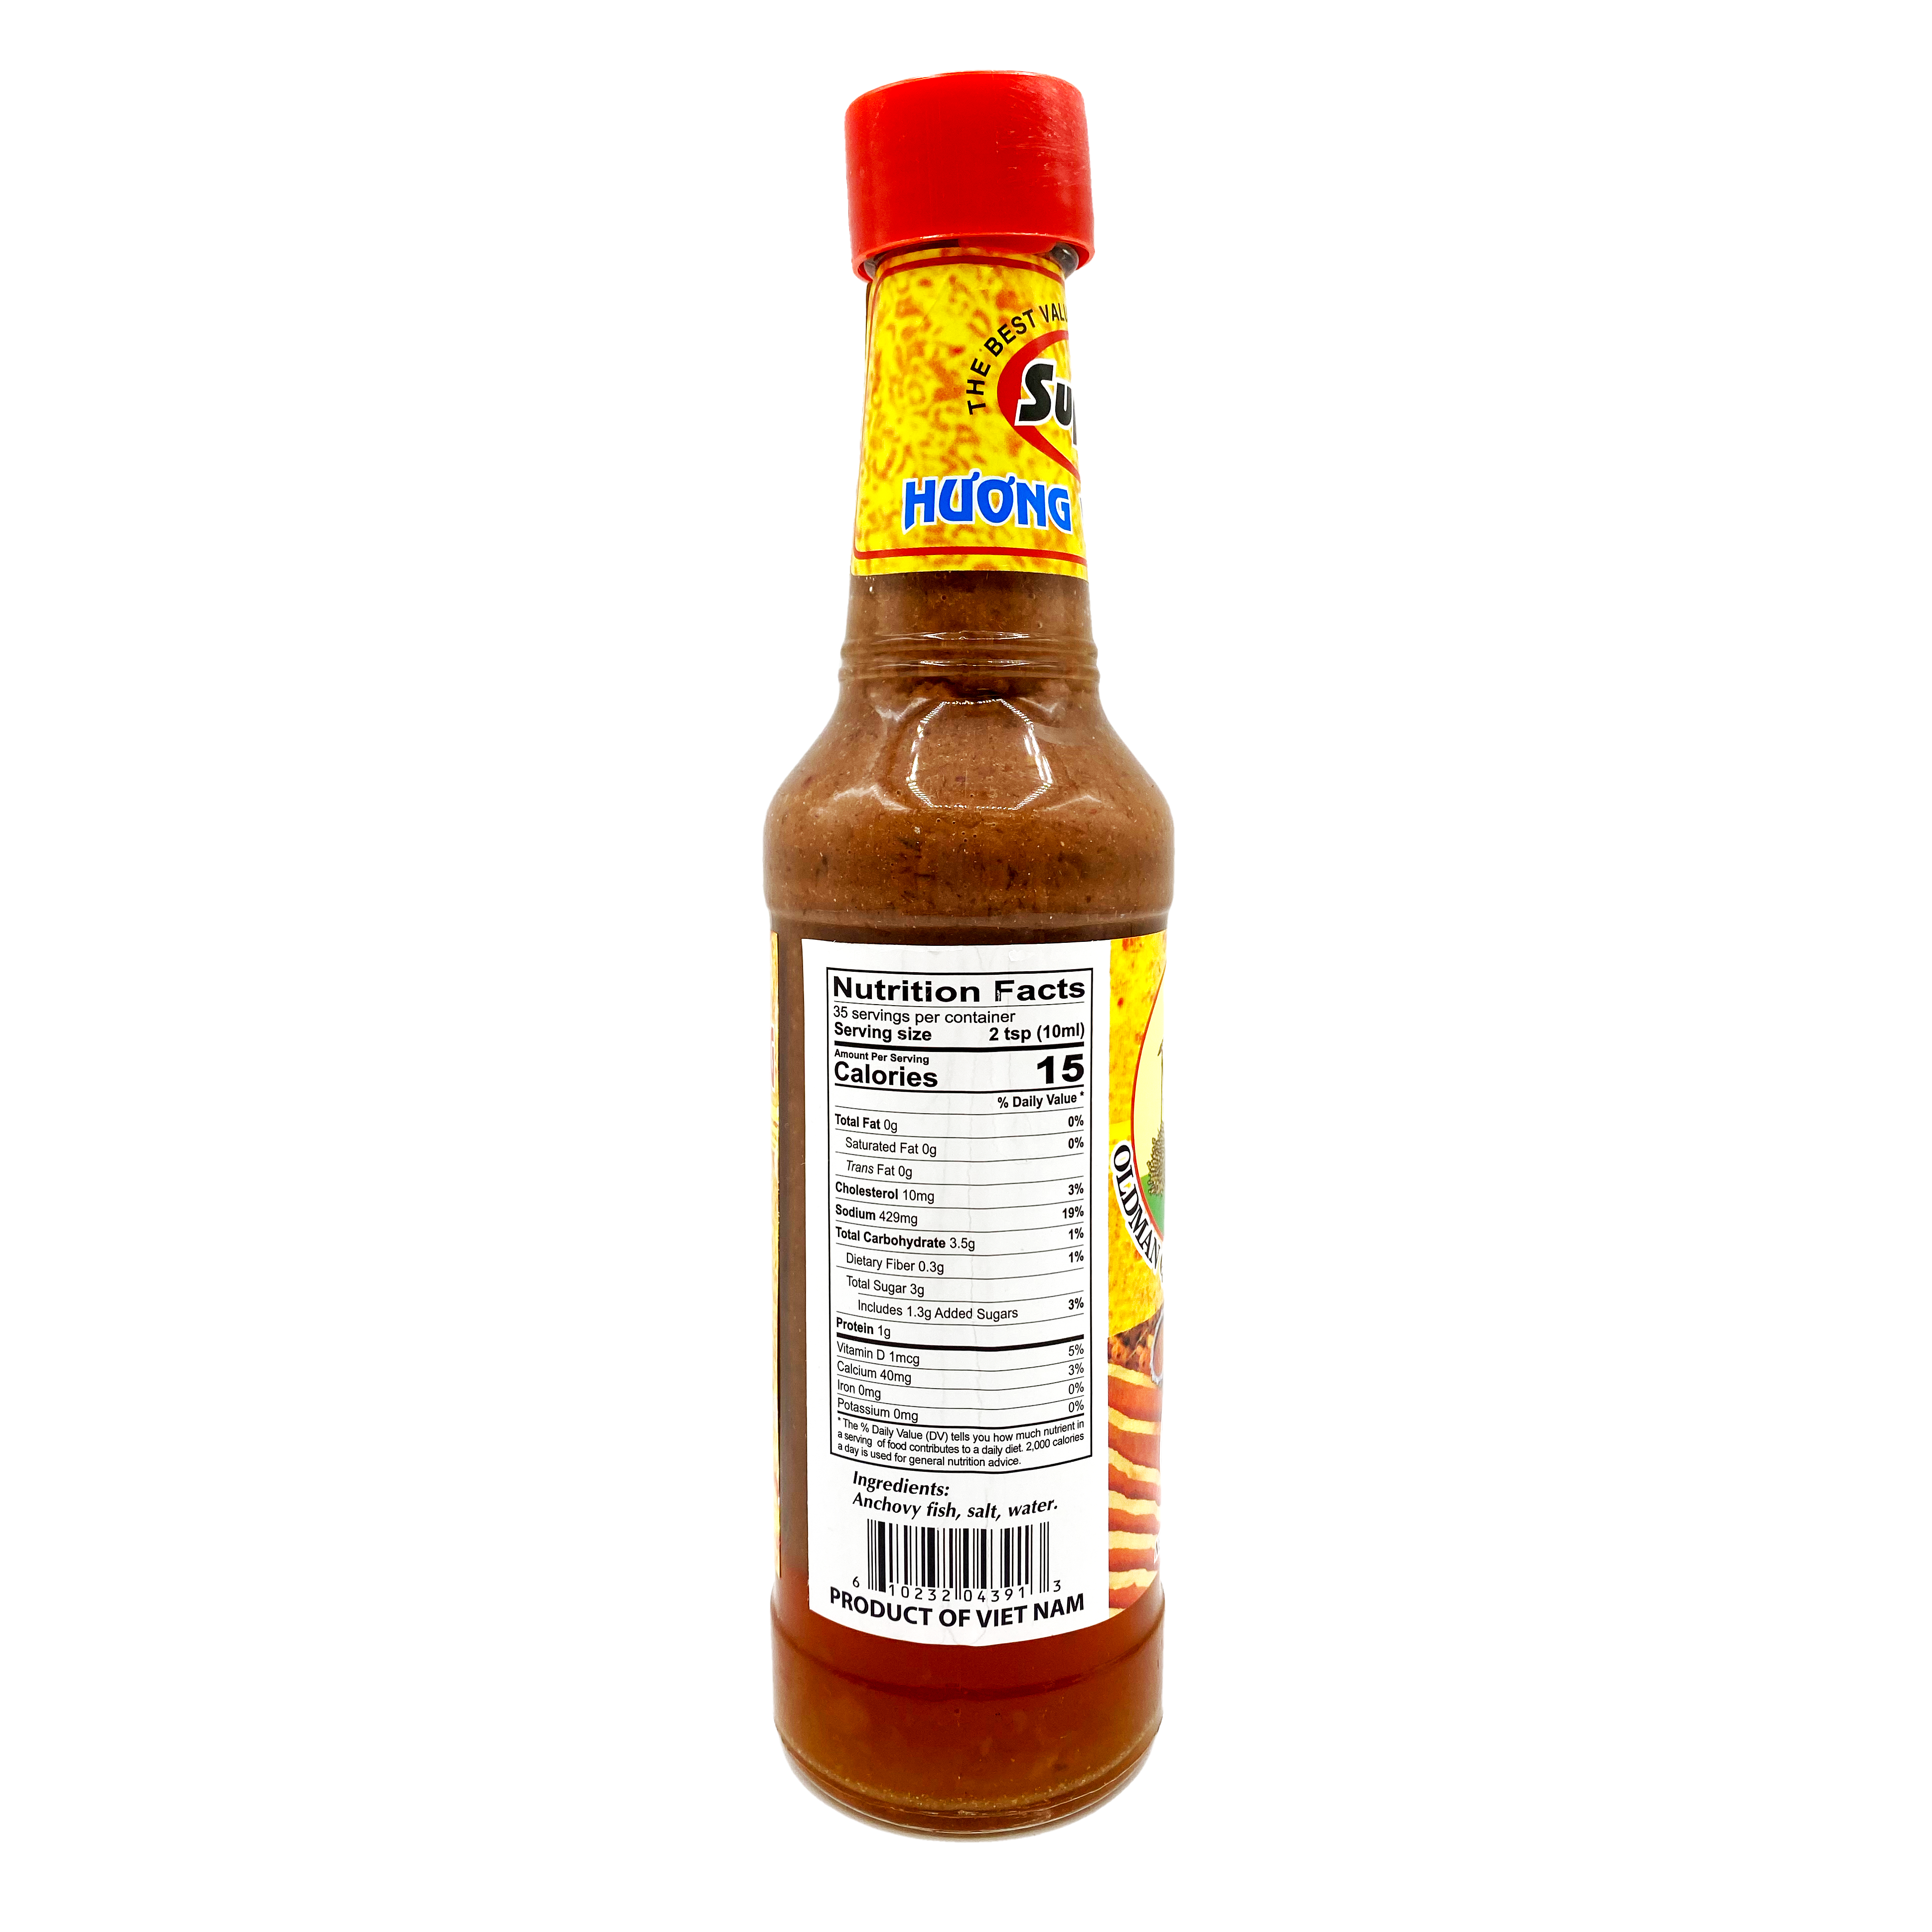 medium oldman que huong fish sauce mam nem pha san 391 12 fl oz vUshnlc77